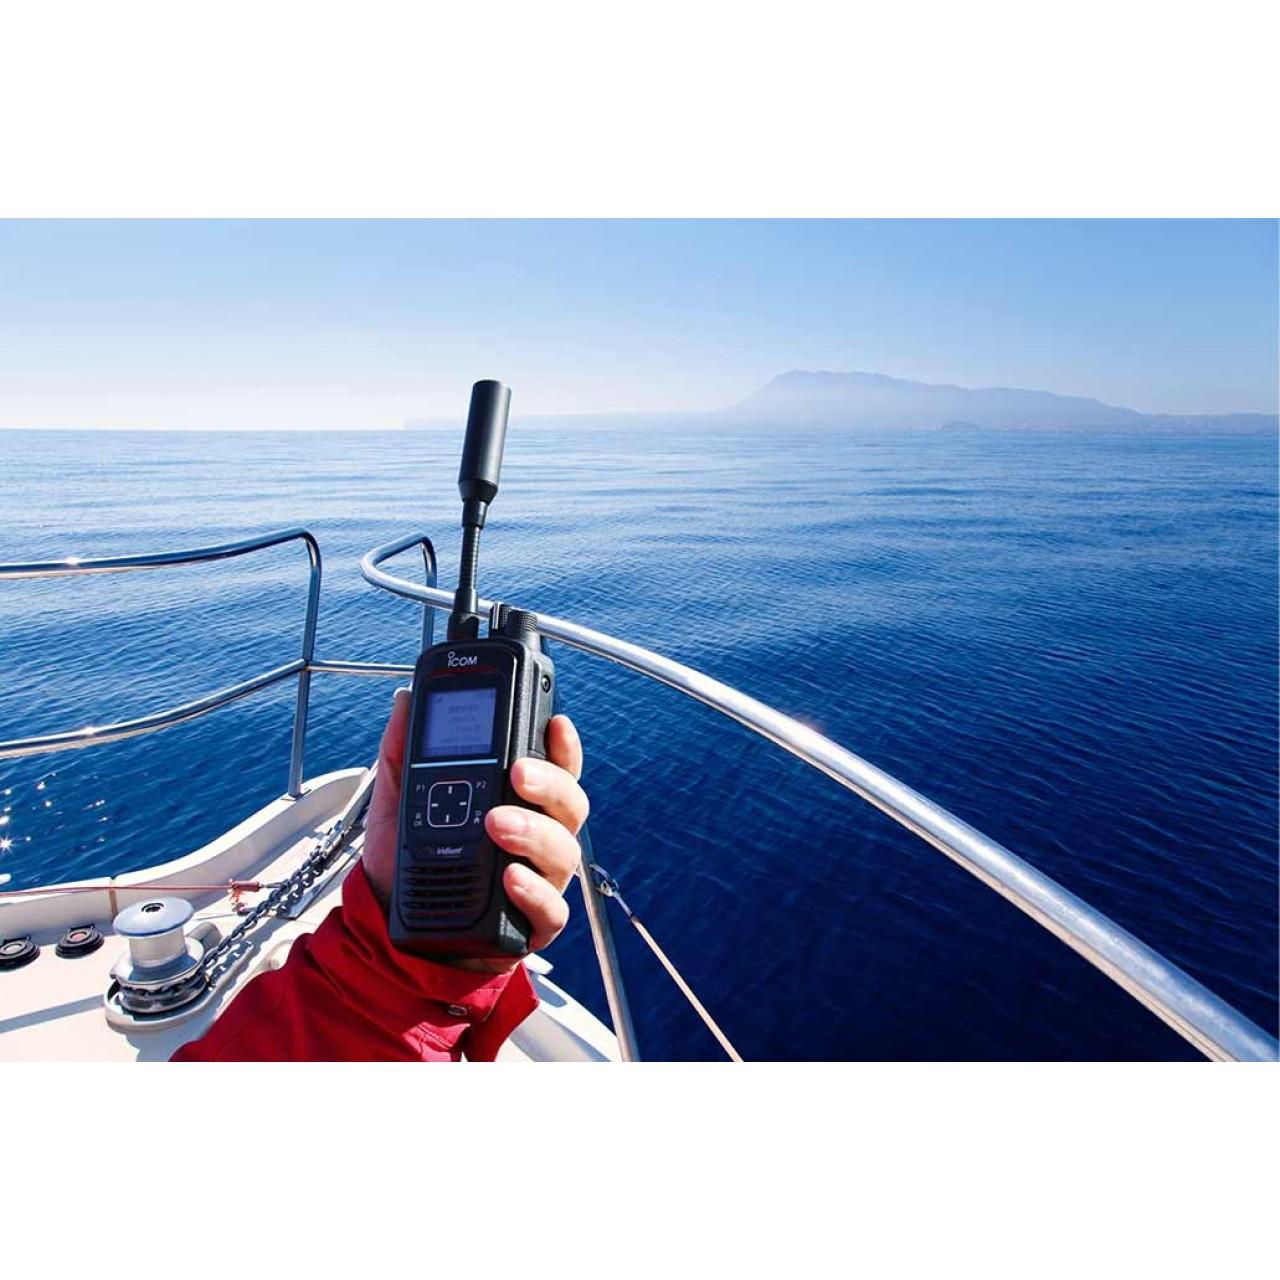 IC-SAT100 Handhelds - ICOM